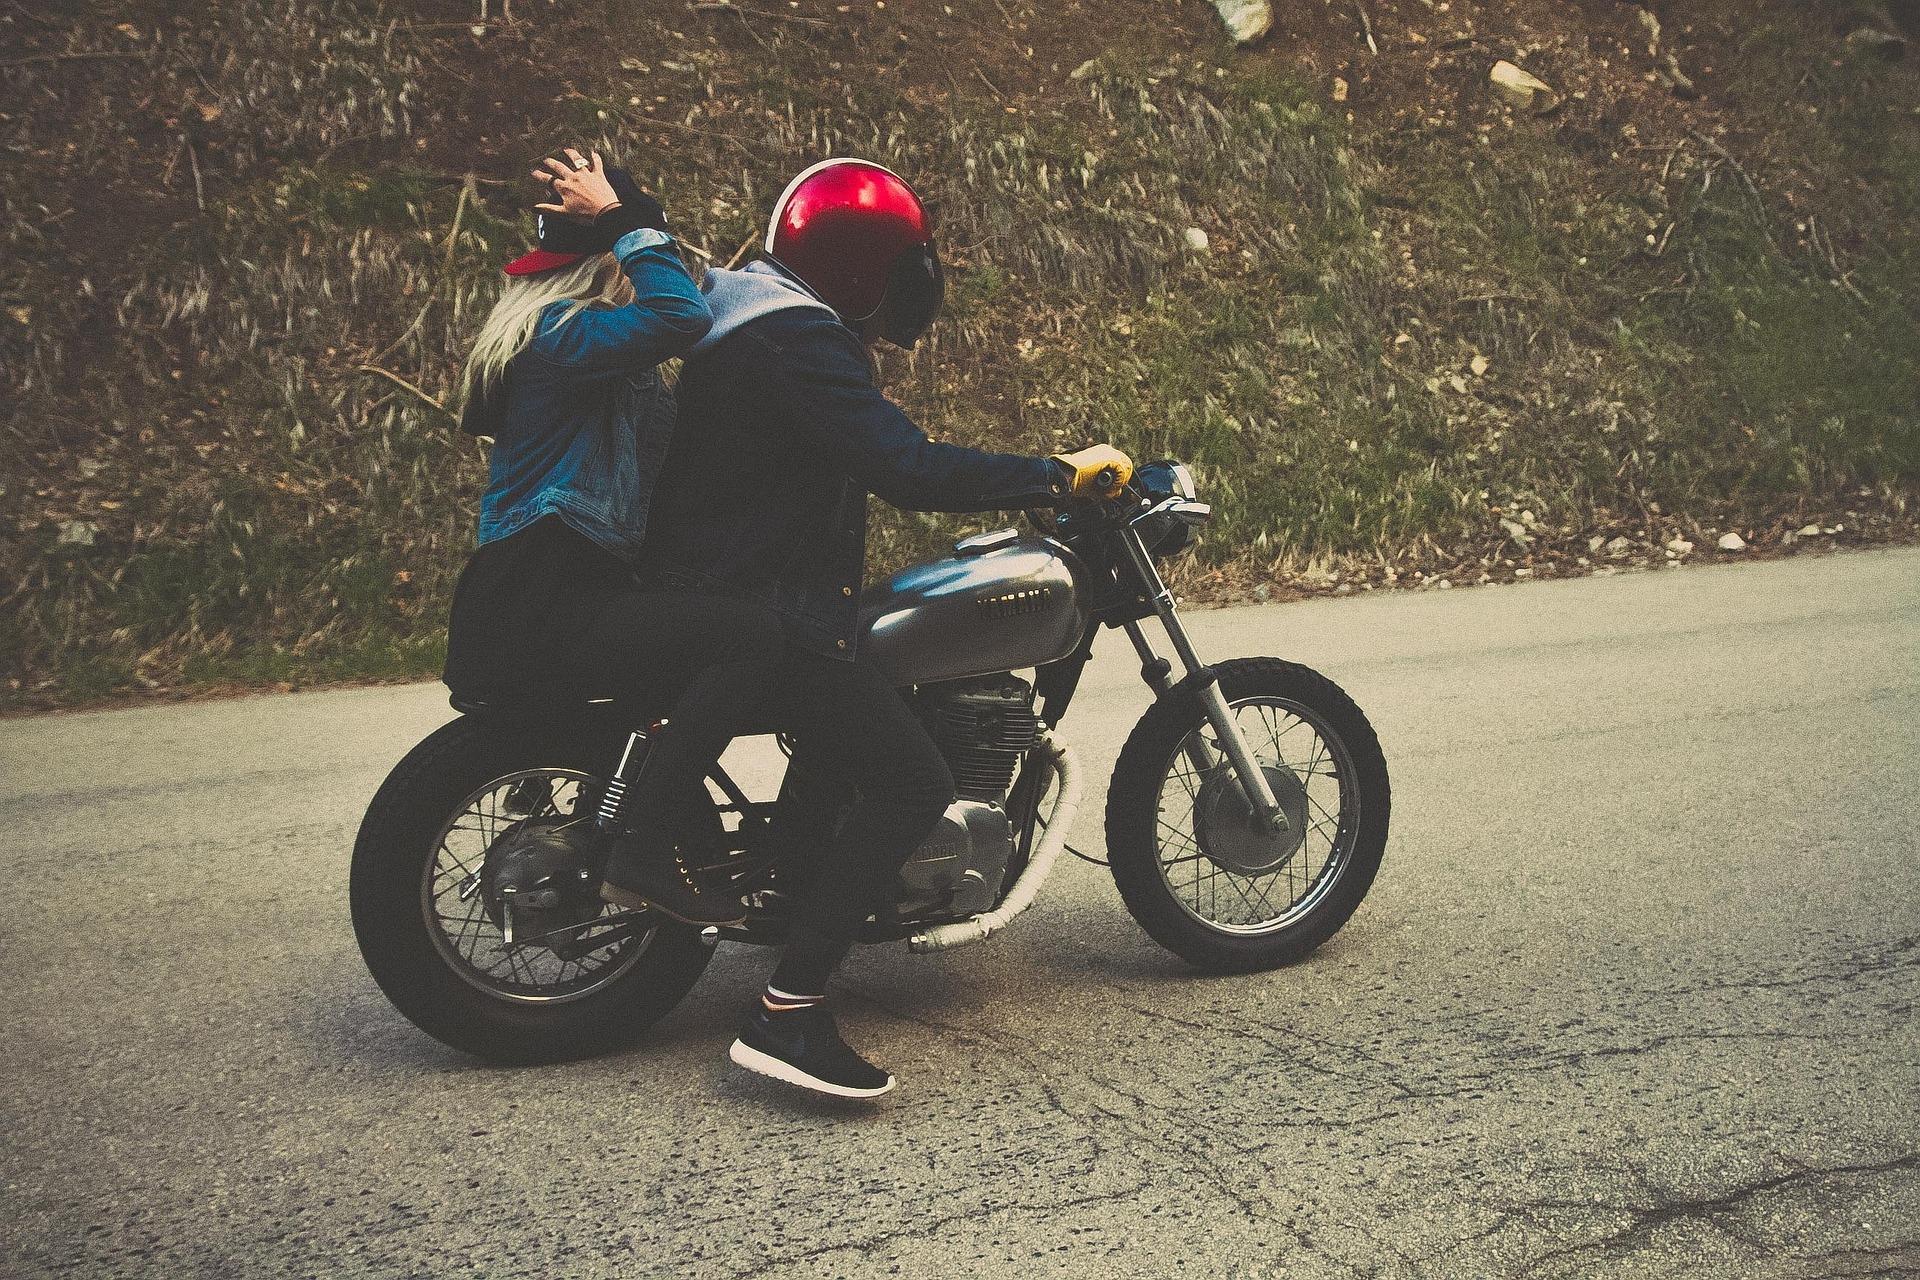 motocyklista